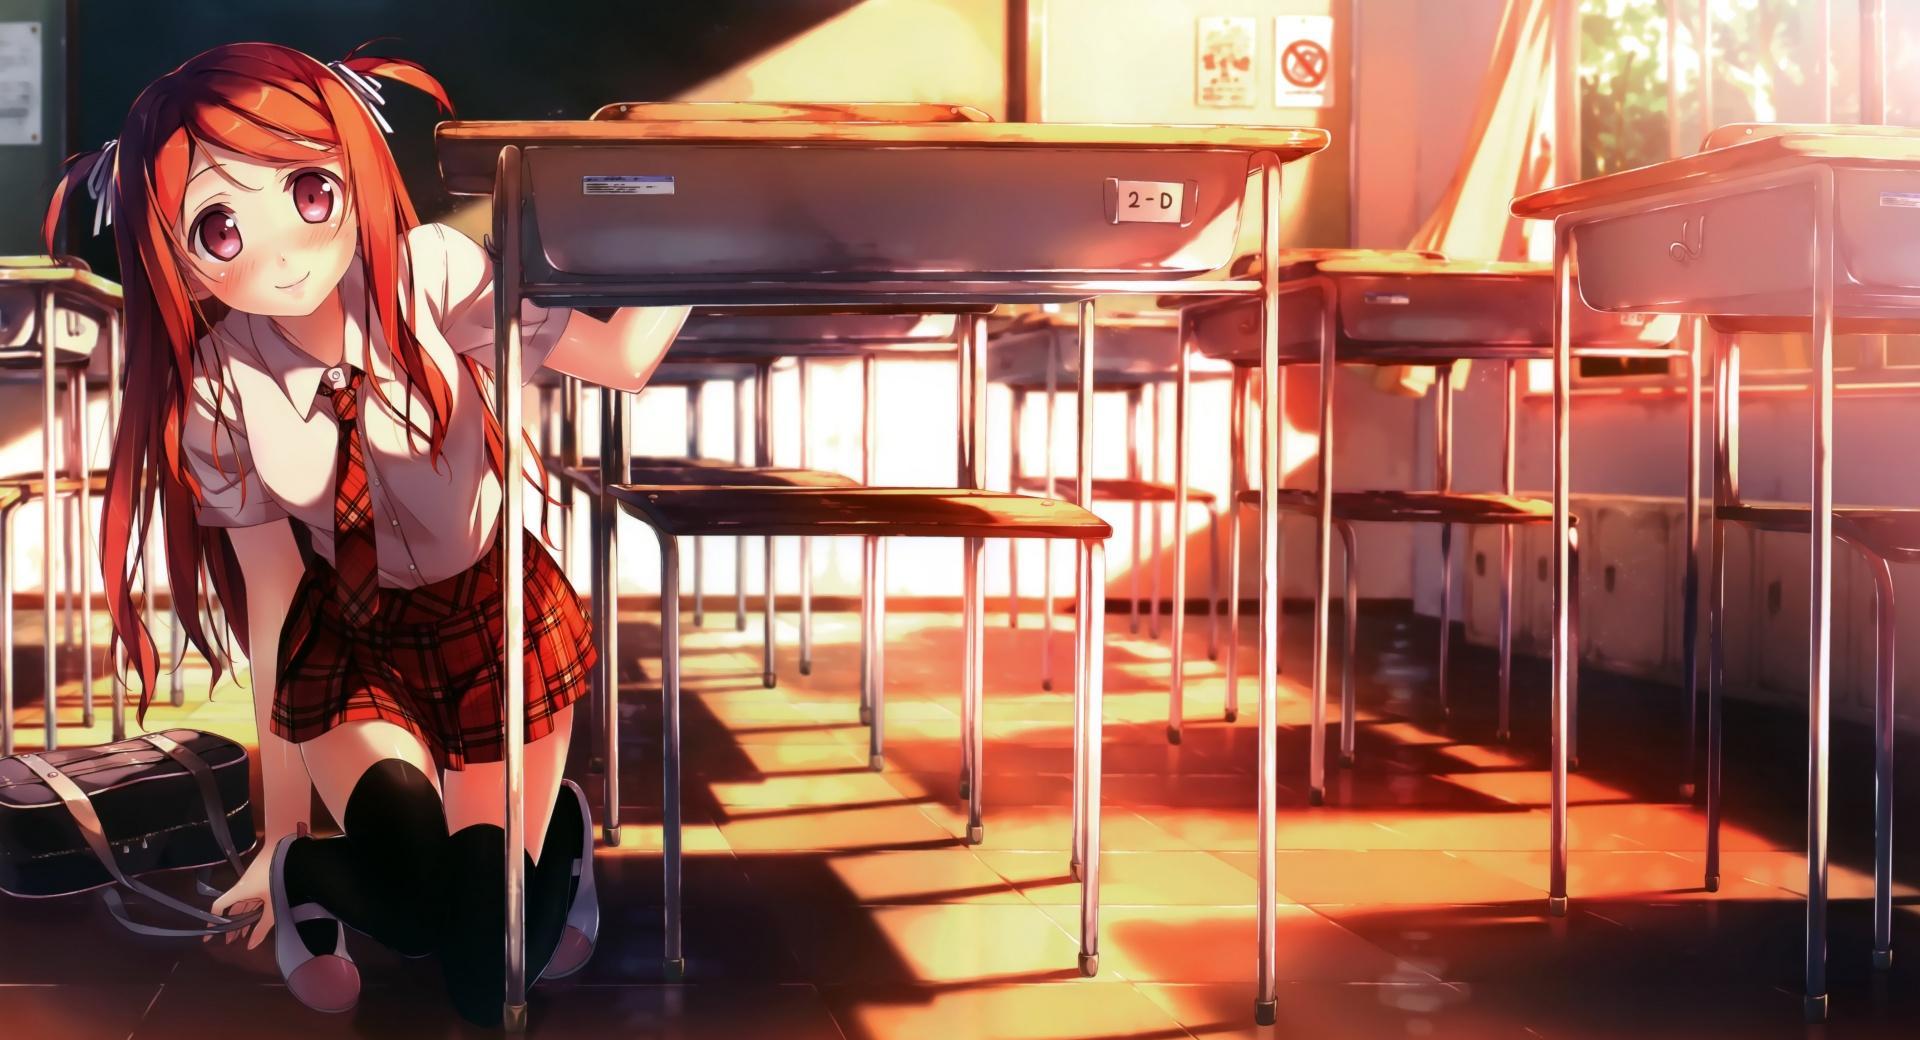 School Love wallpapers HD quality